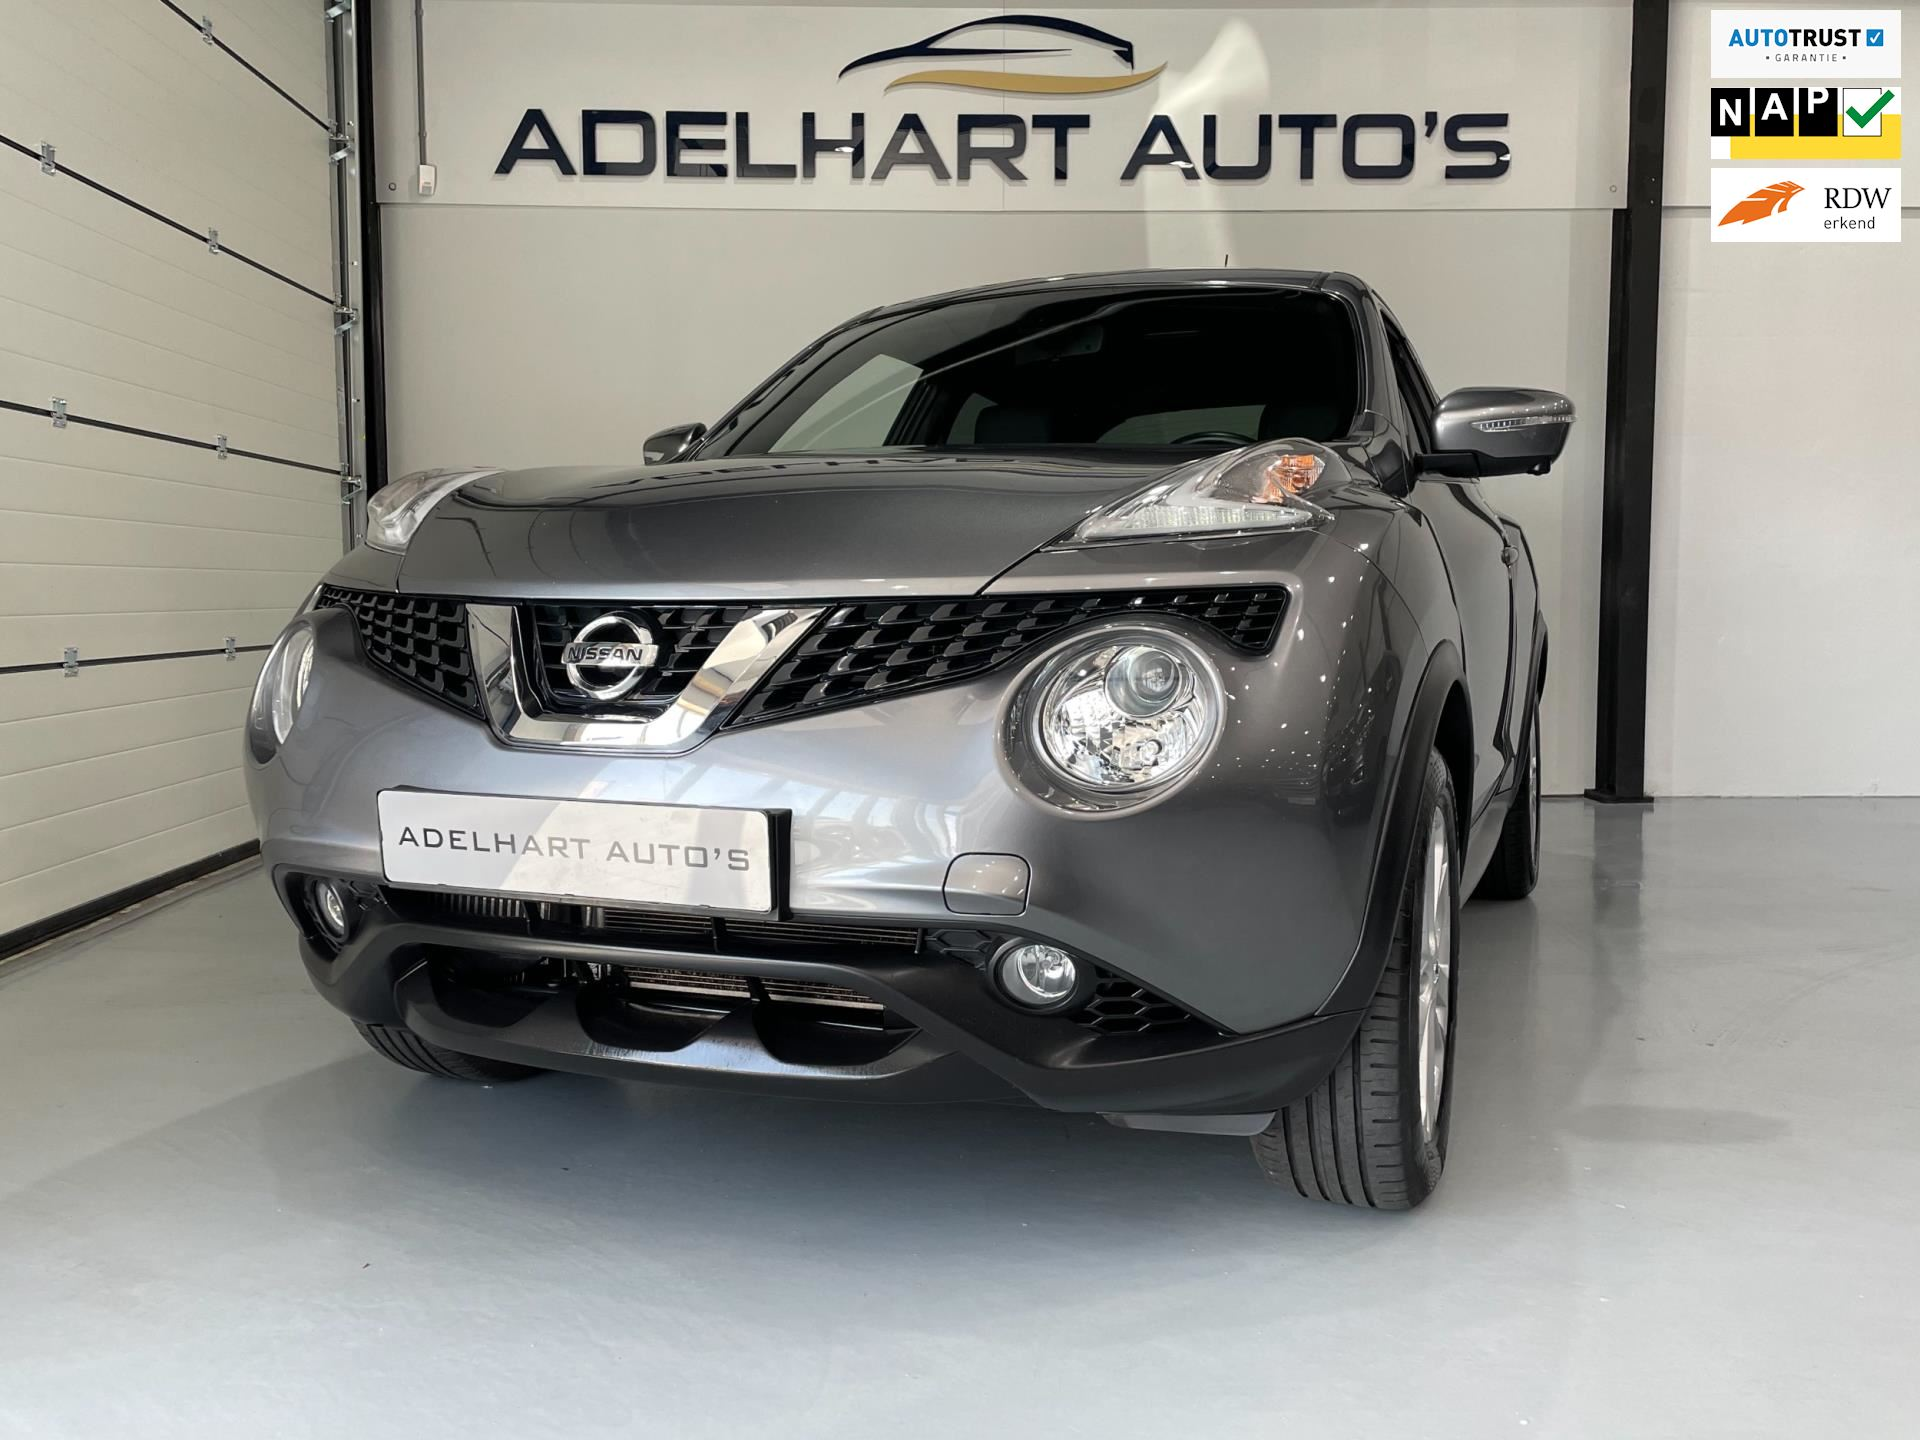 Nissan Juke occasion - Adelhart Autos